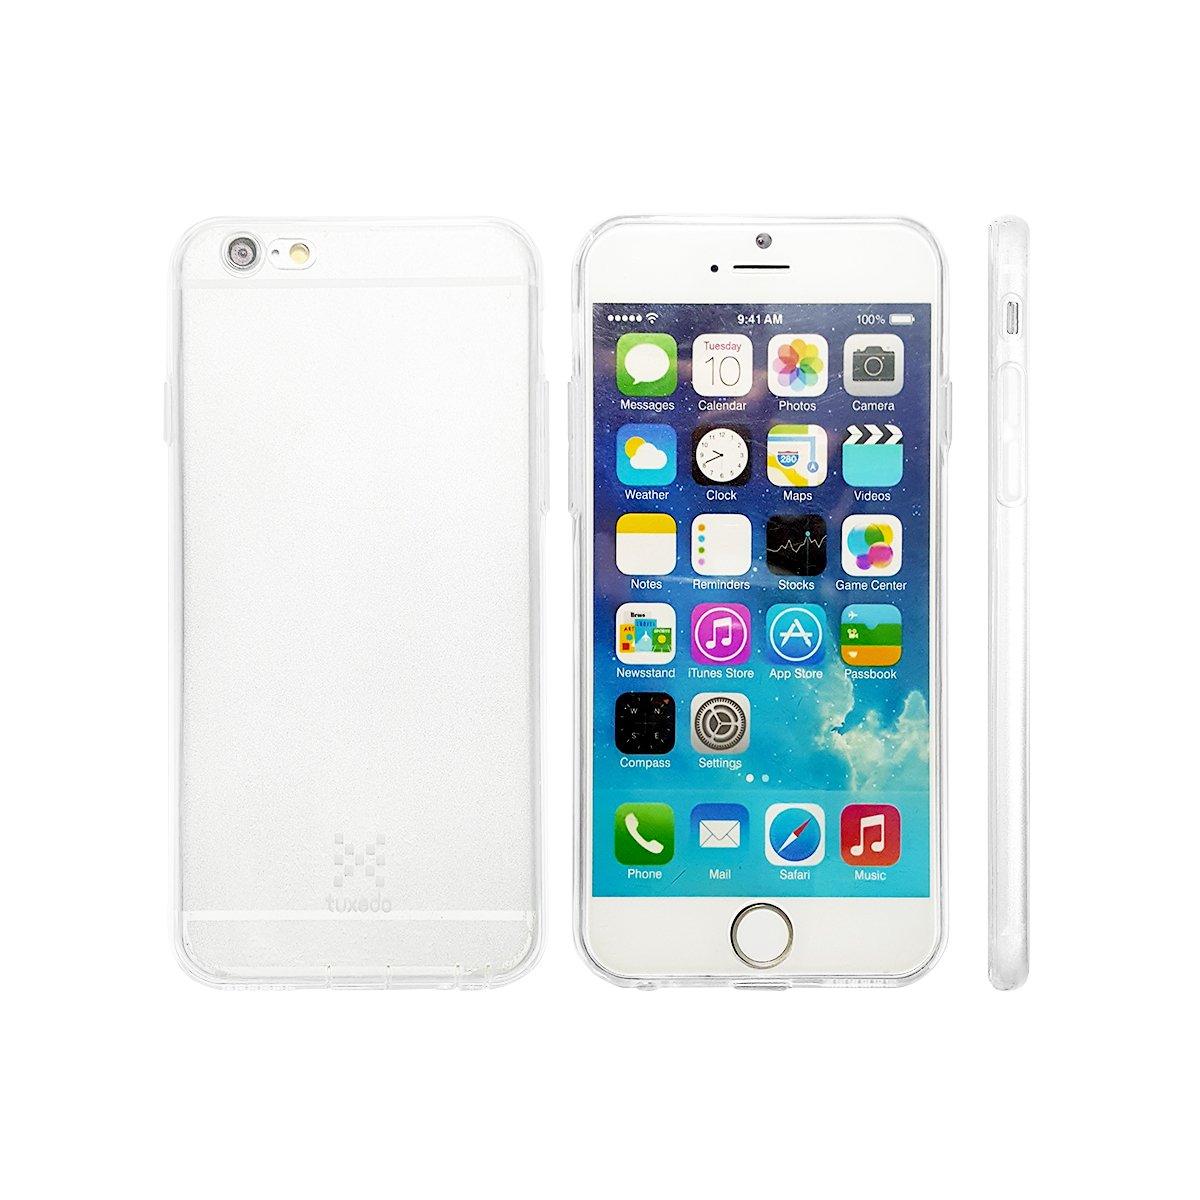 Ốp lưng iPhone 6/6S, Tuxedo AirSkin